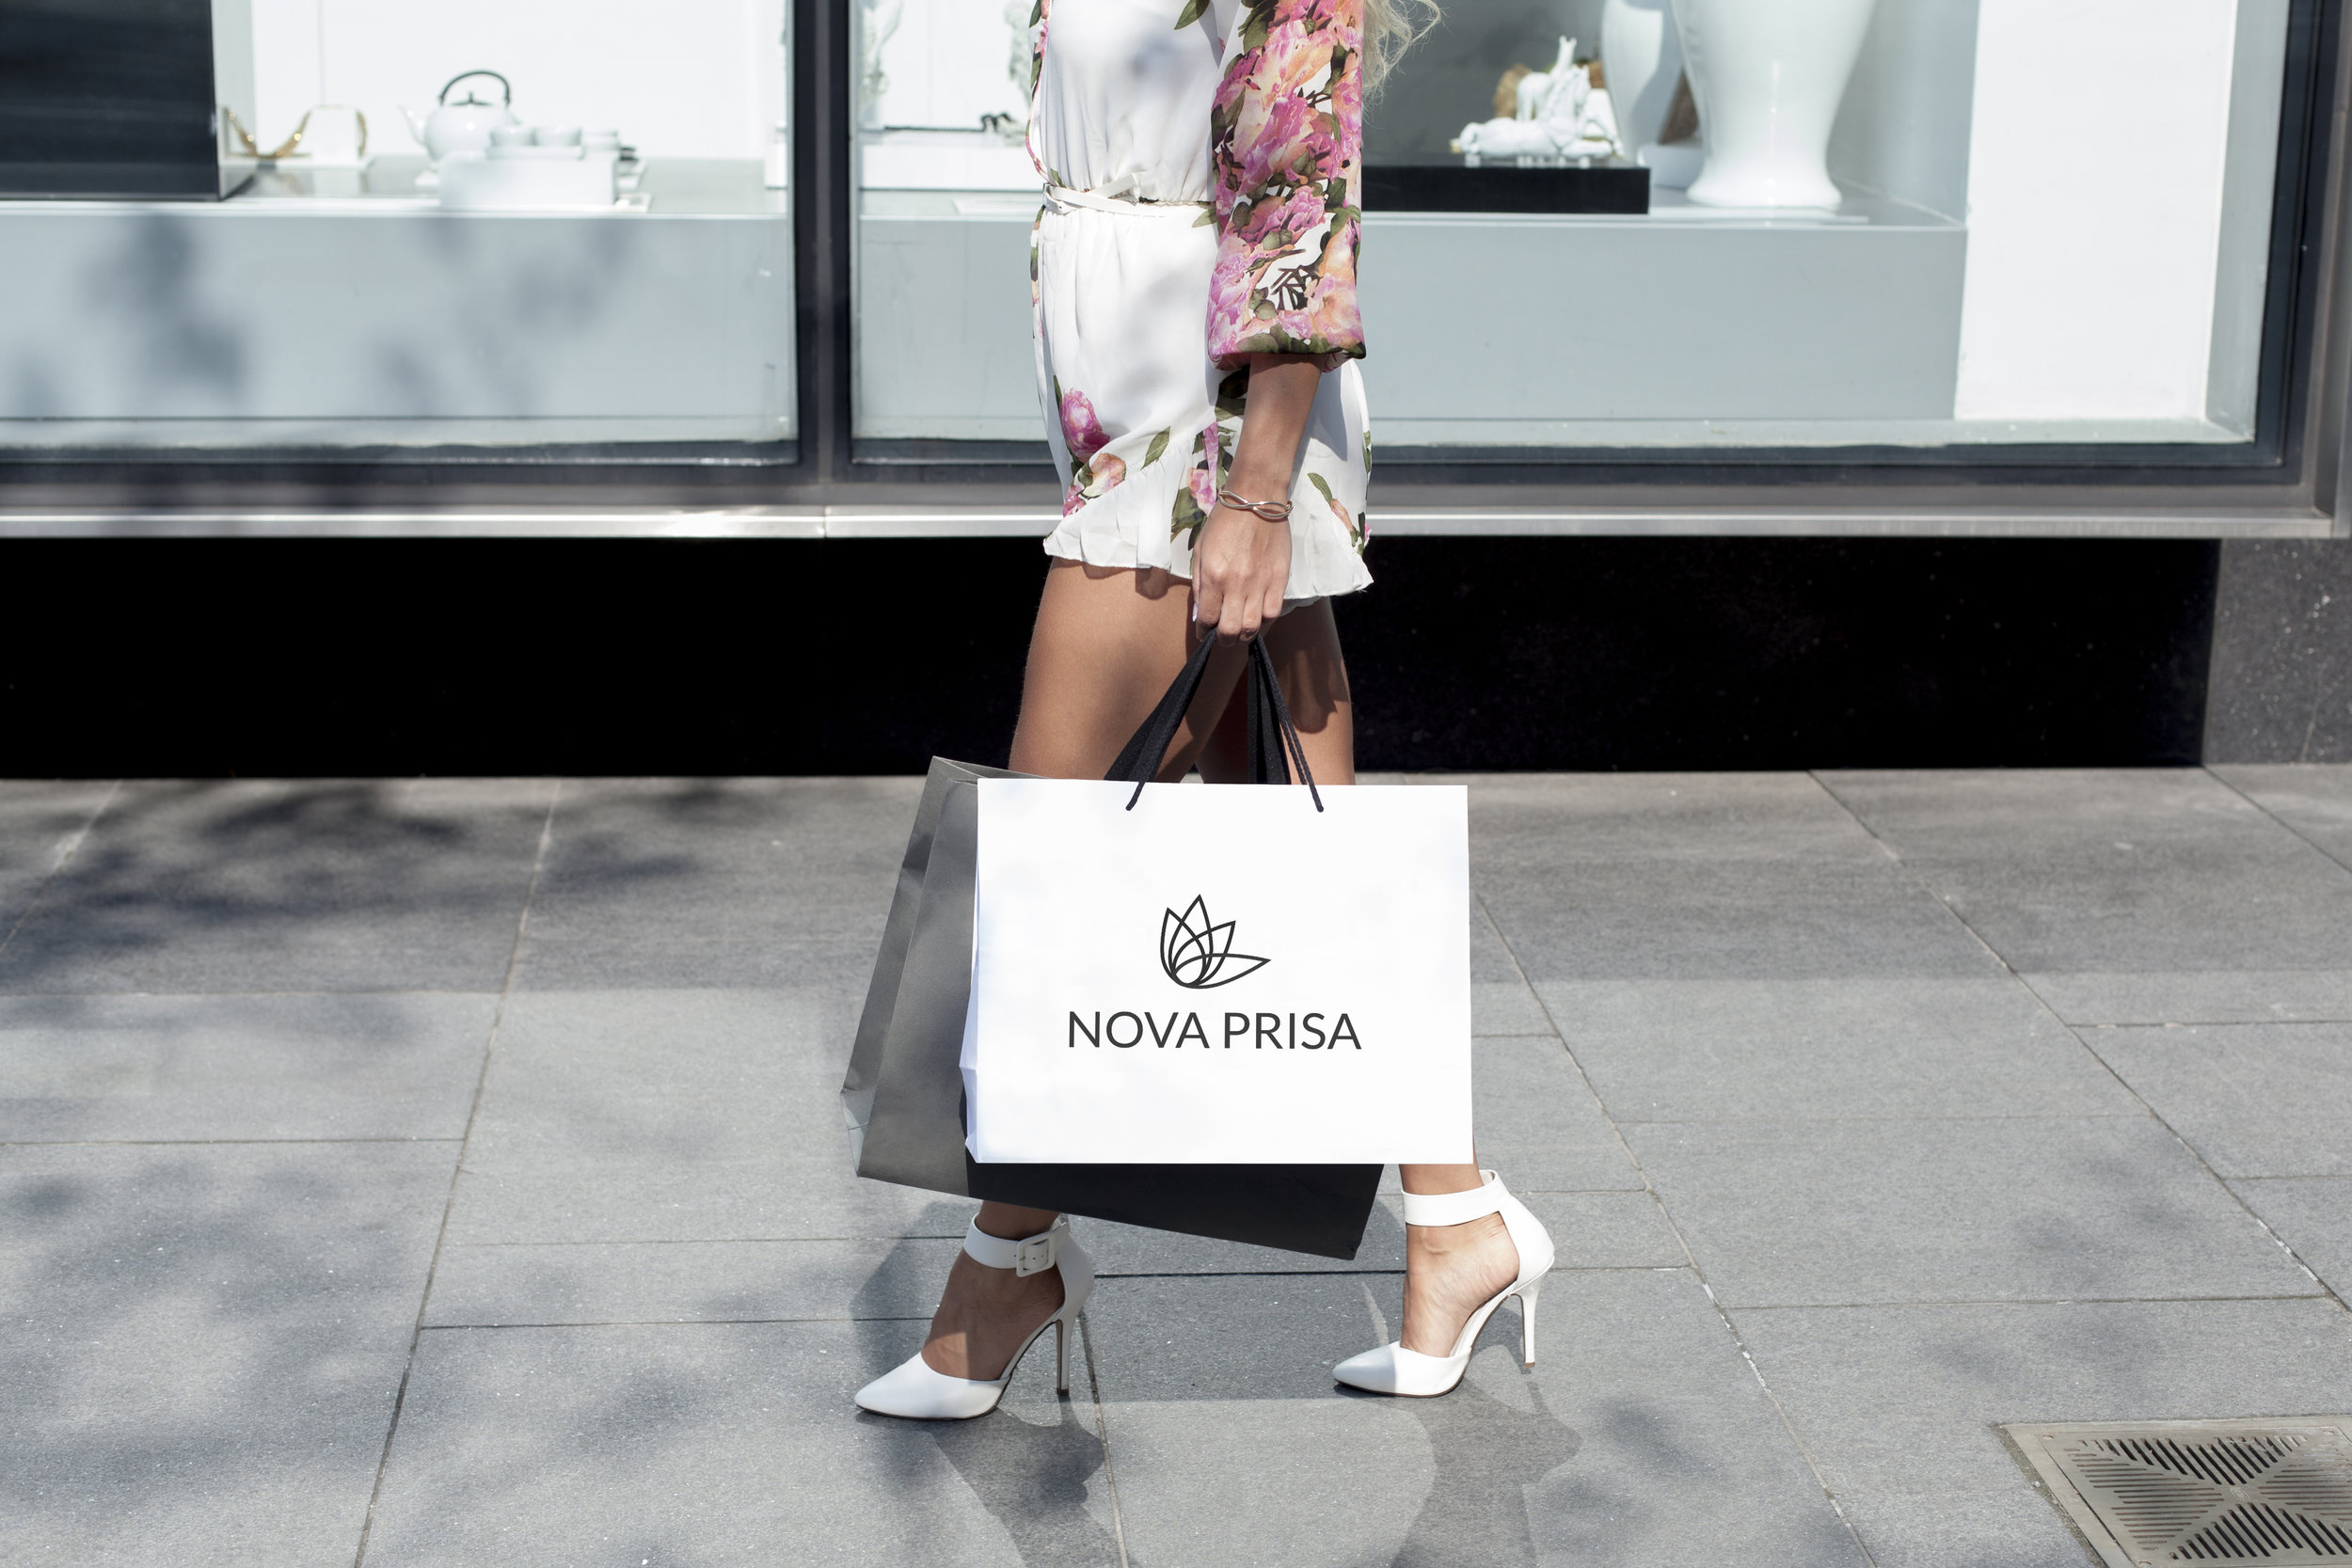 Nova Prisa Shopping Bag.jpg